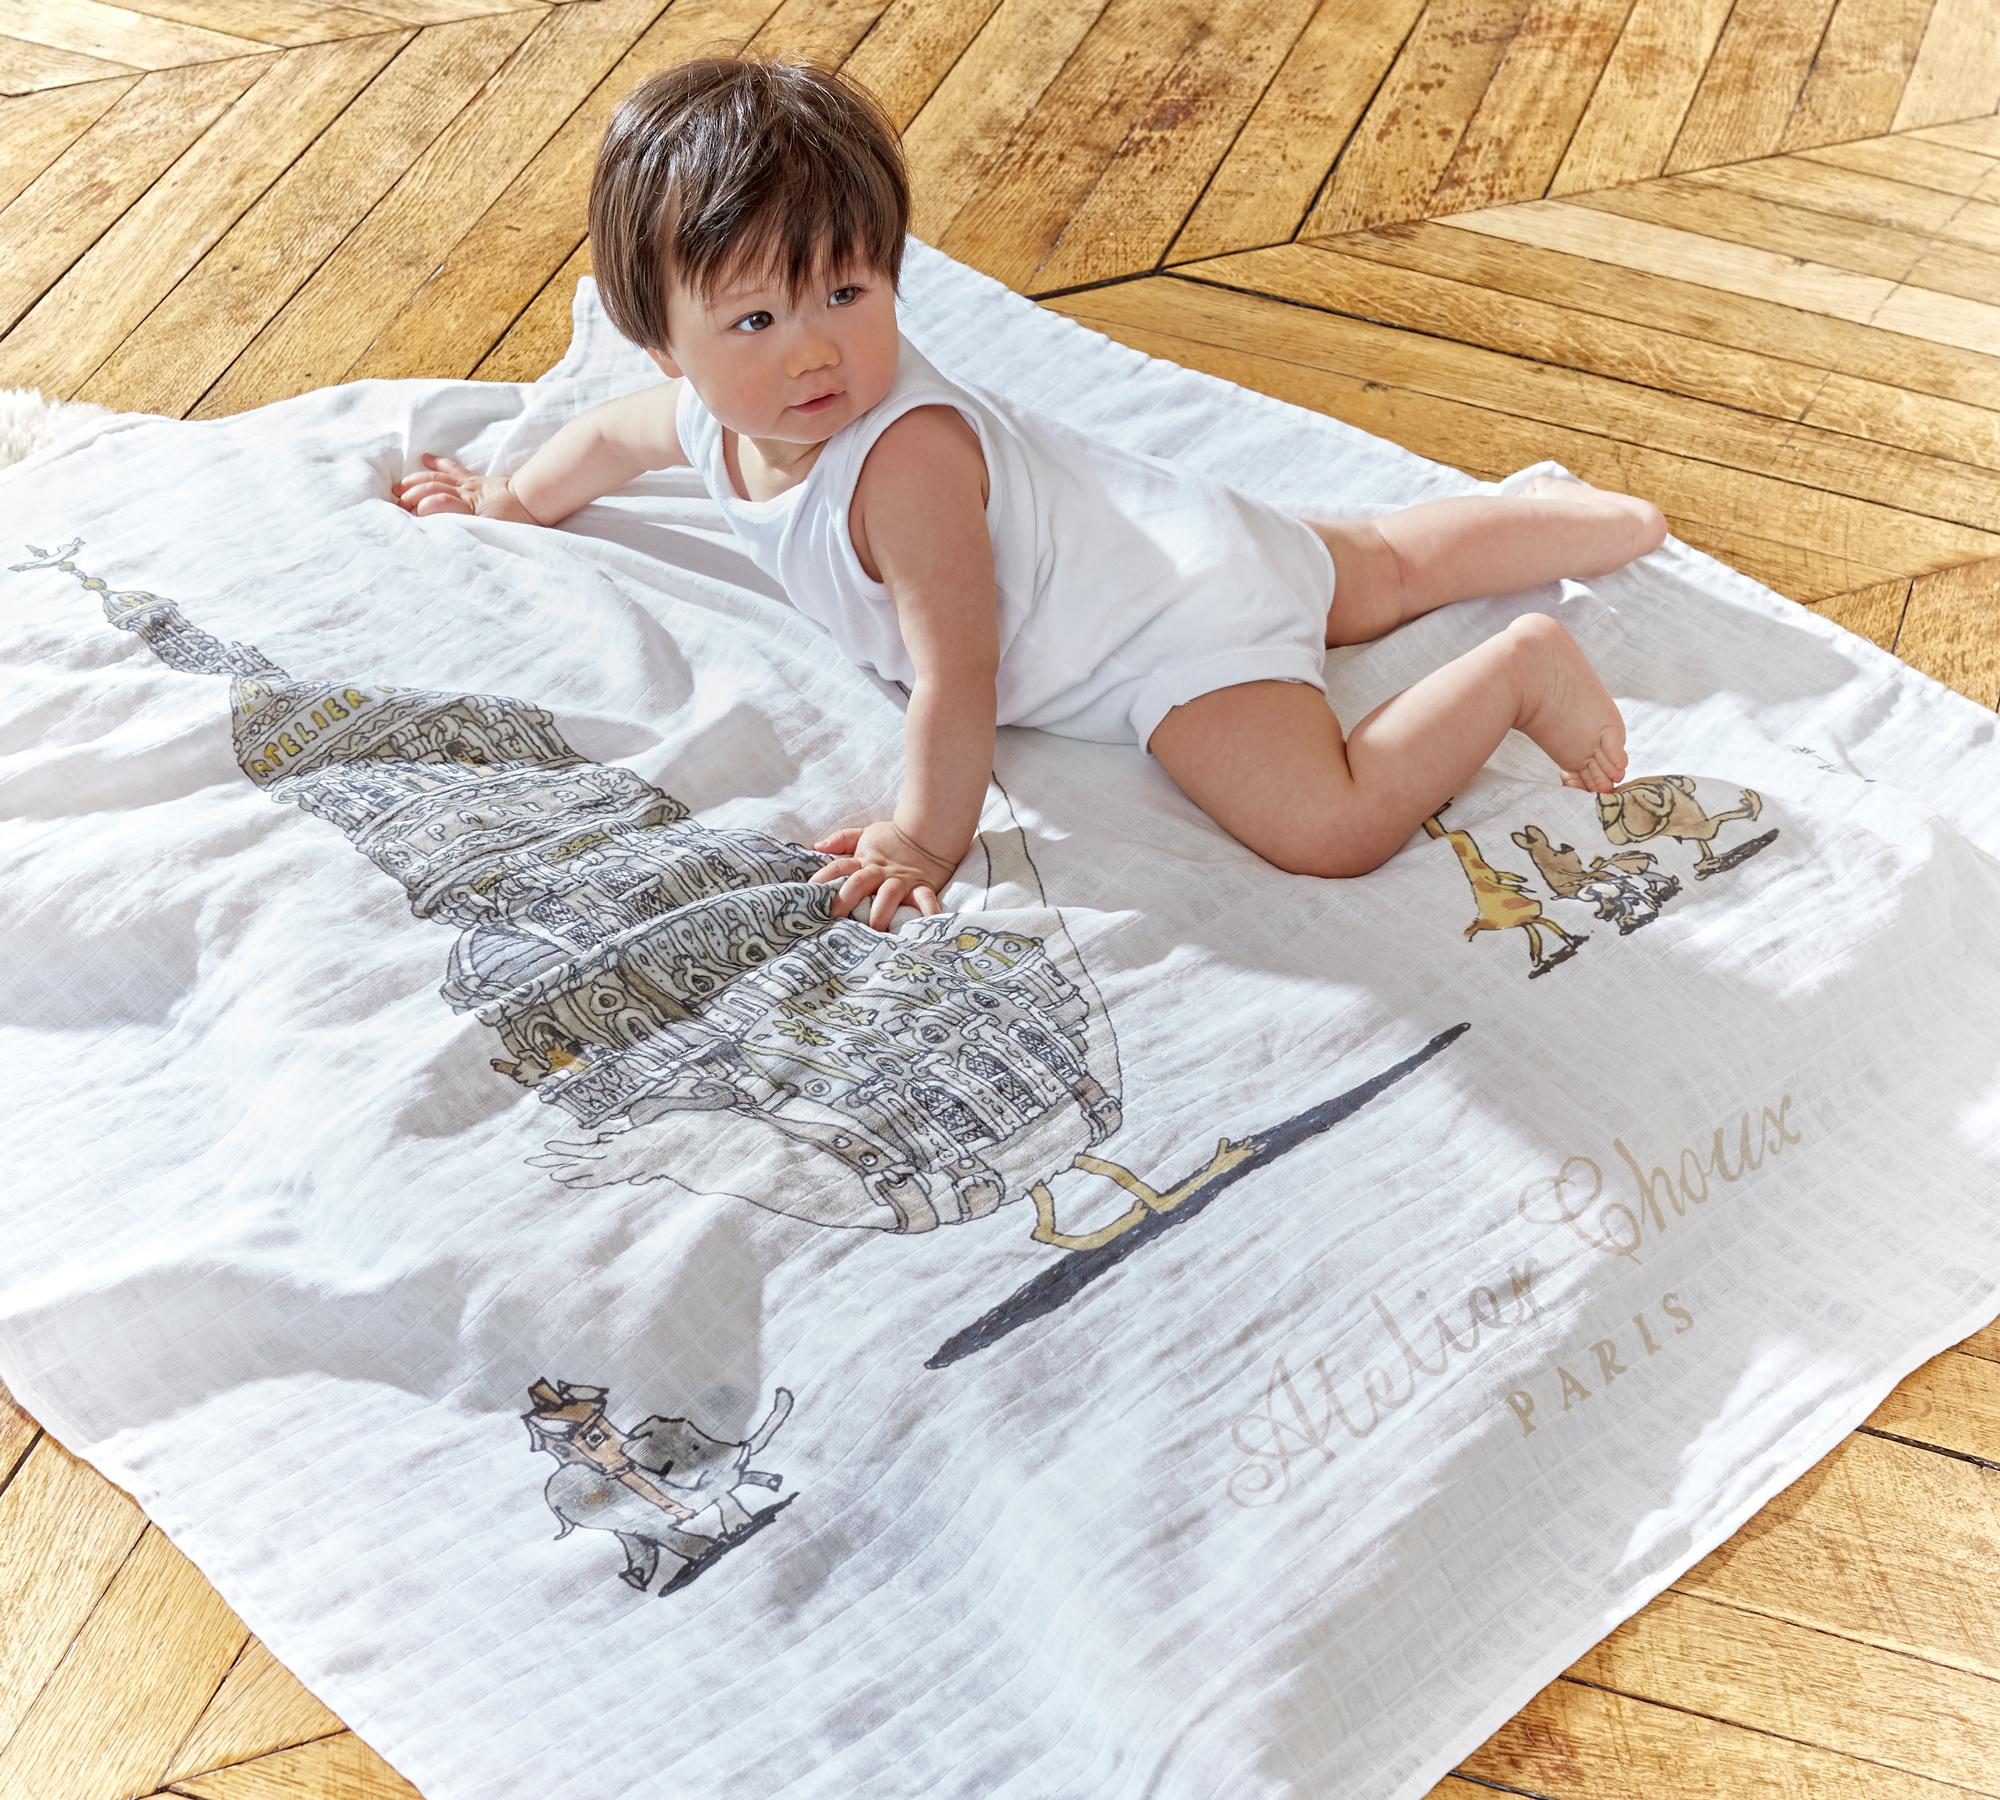 Aufgefallen: Babydecke | HIMBEER Magazin